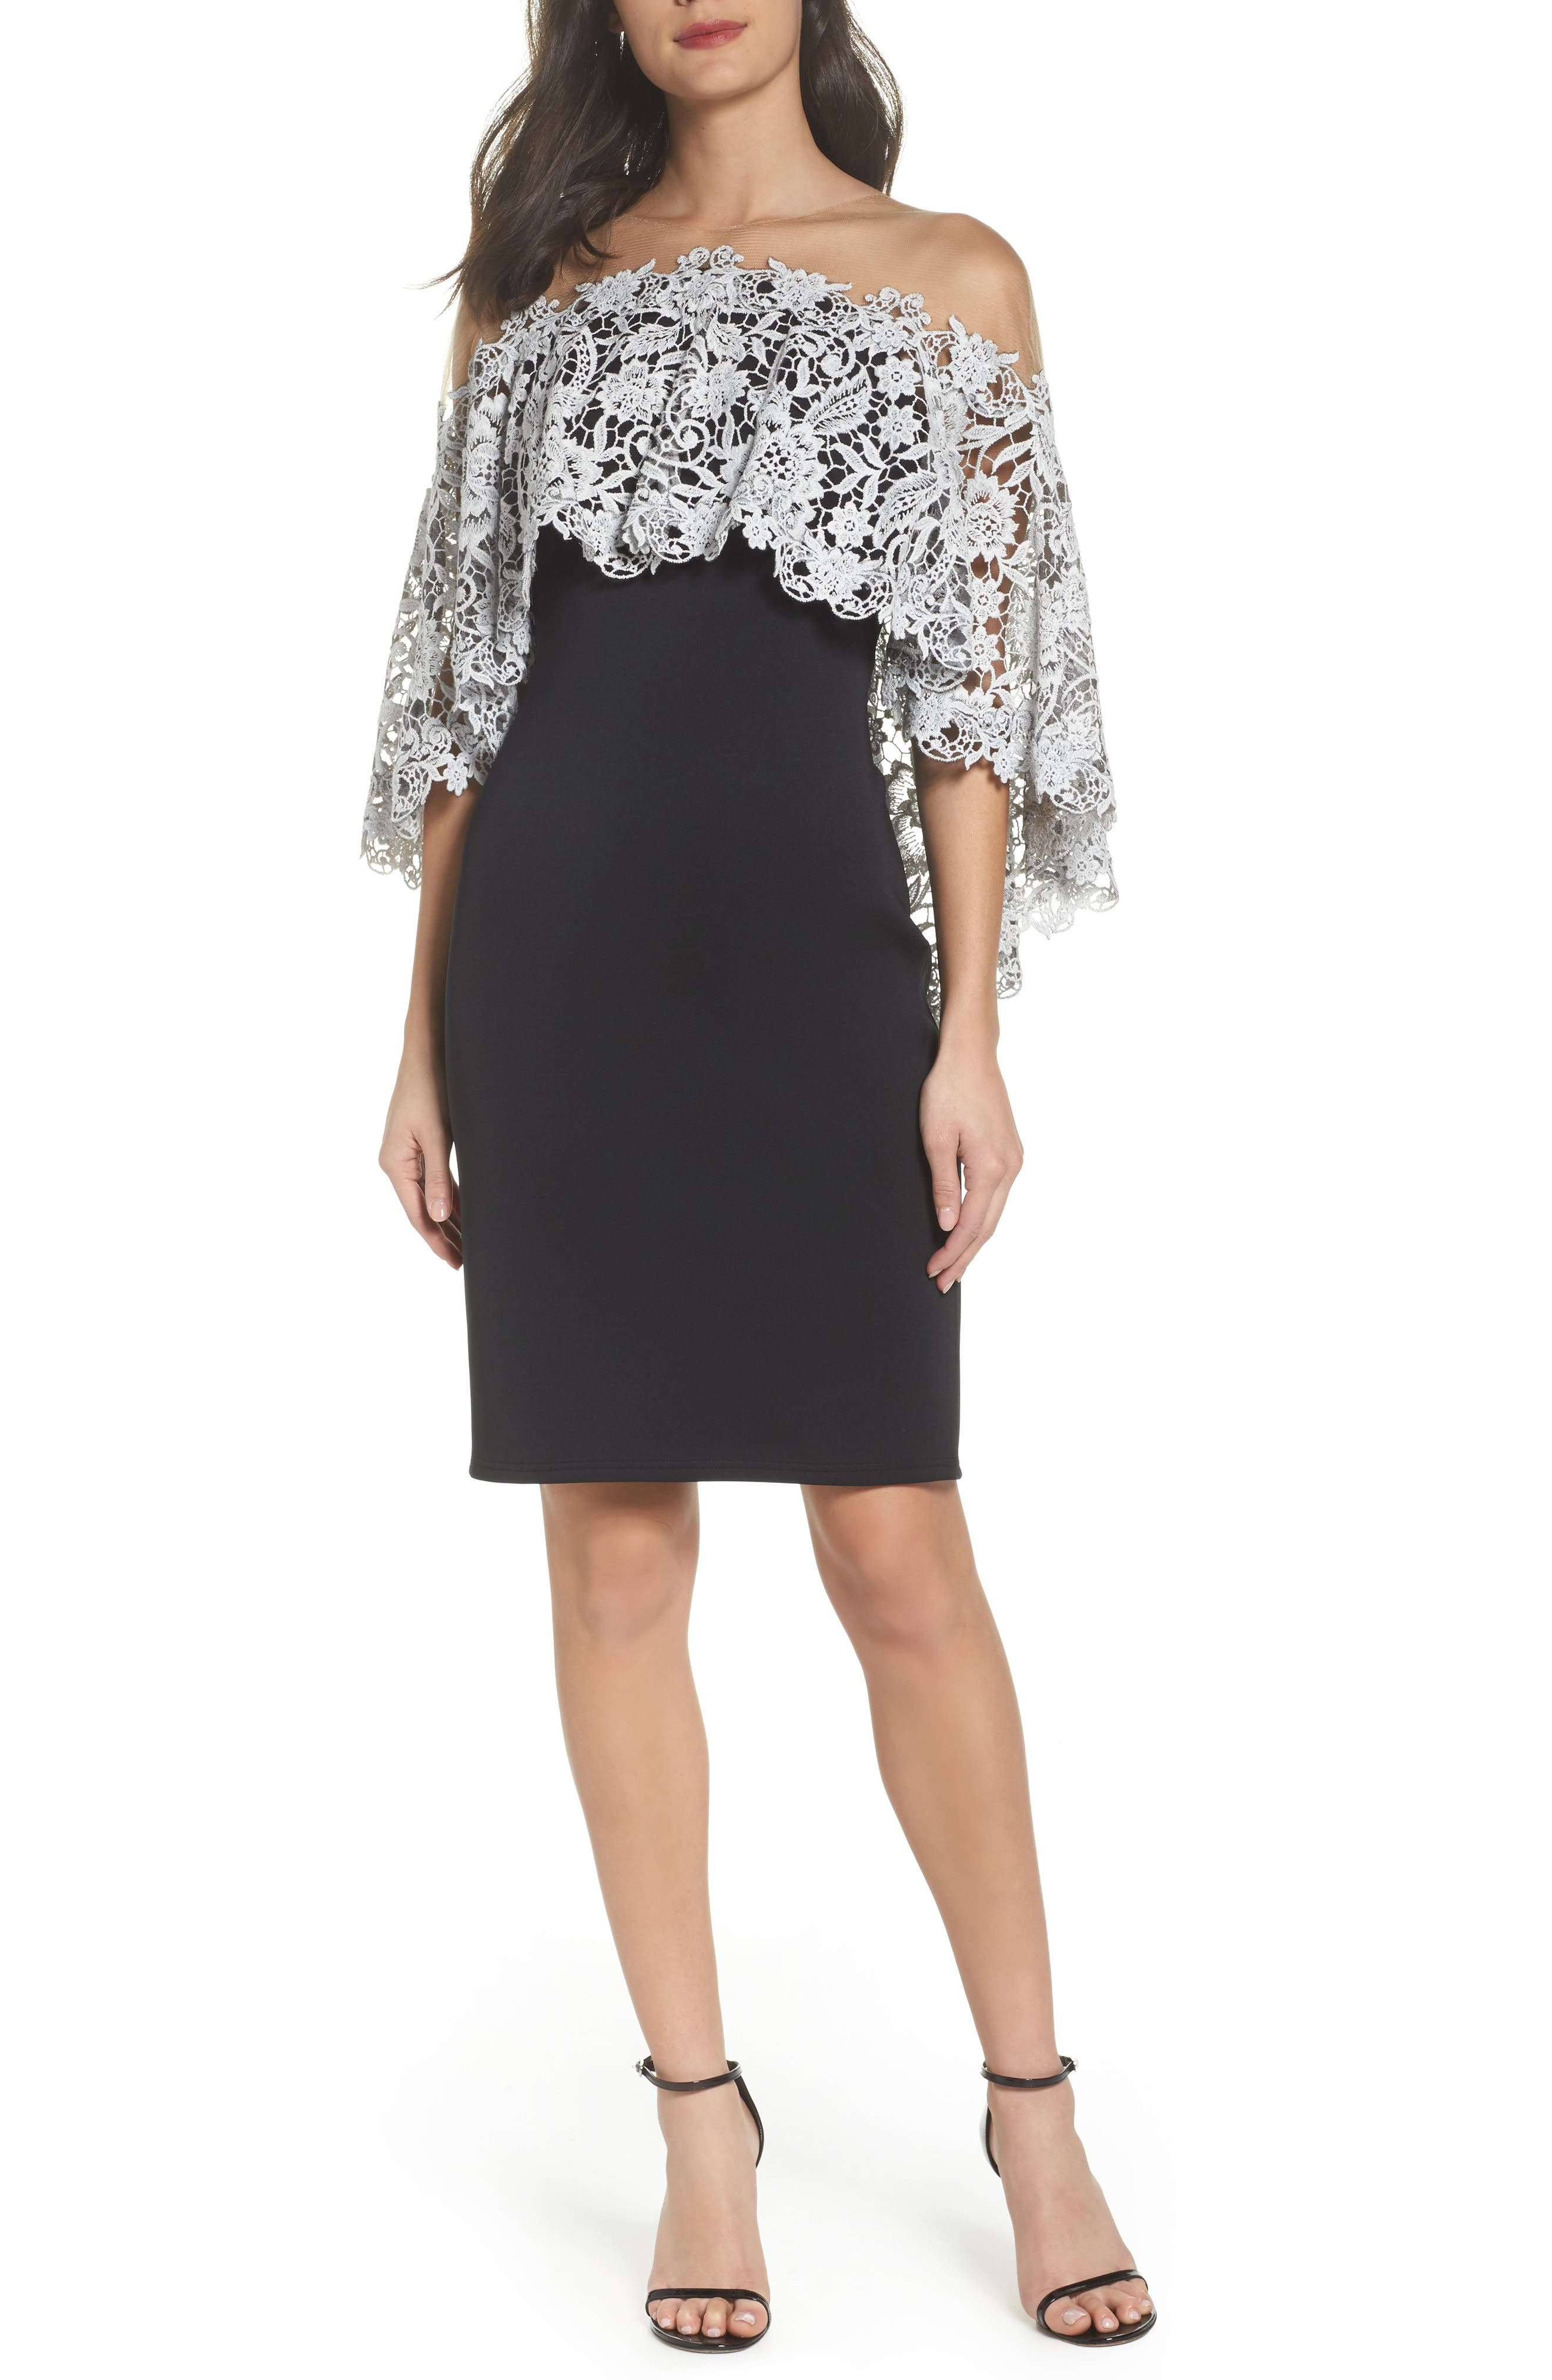 Illusion Neck Cape Dress,                             Main thumbnail 1, color,                             Black/ Ivory